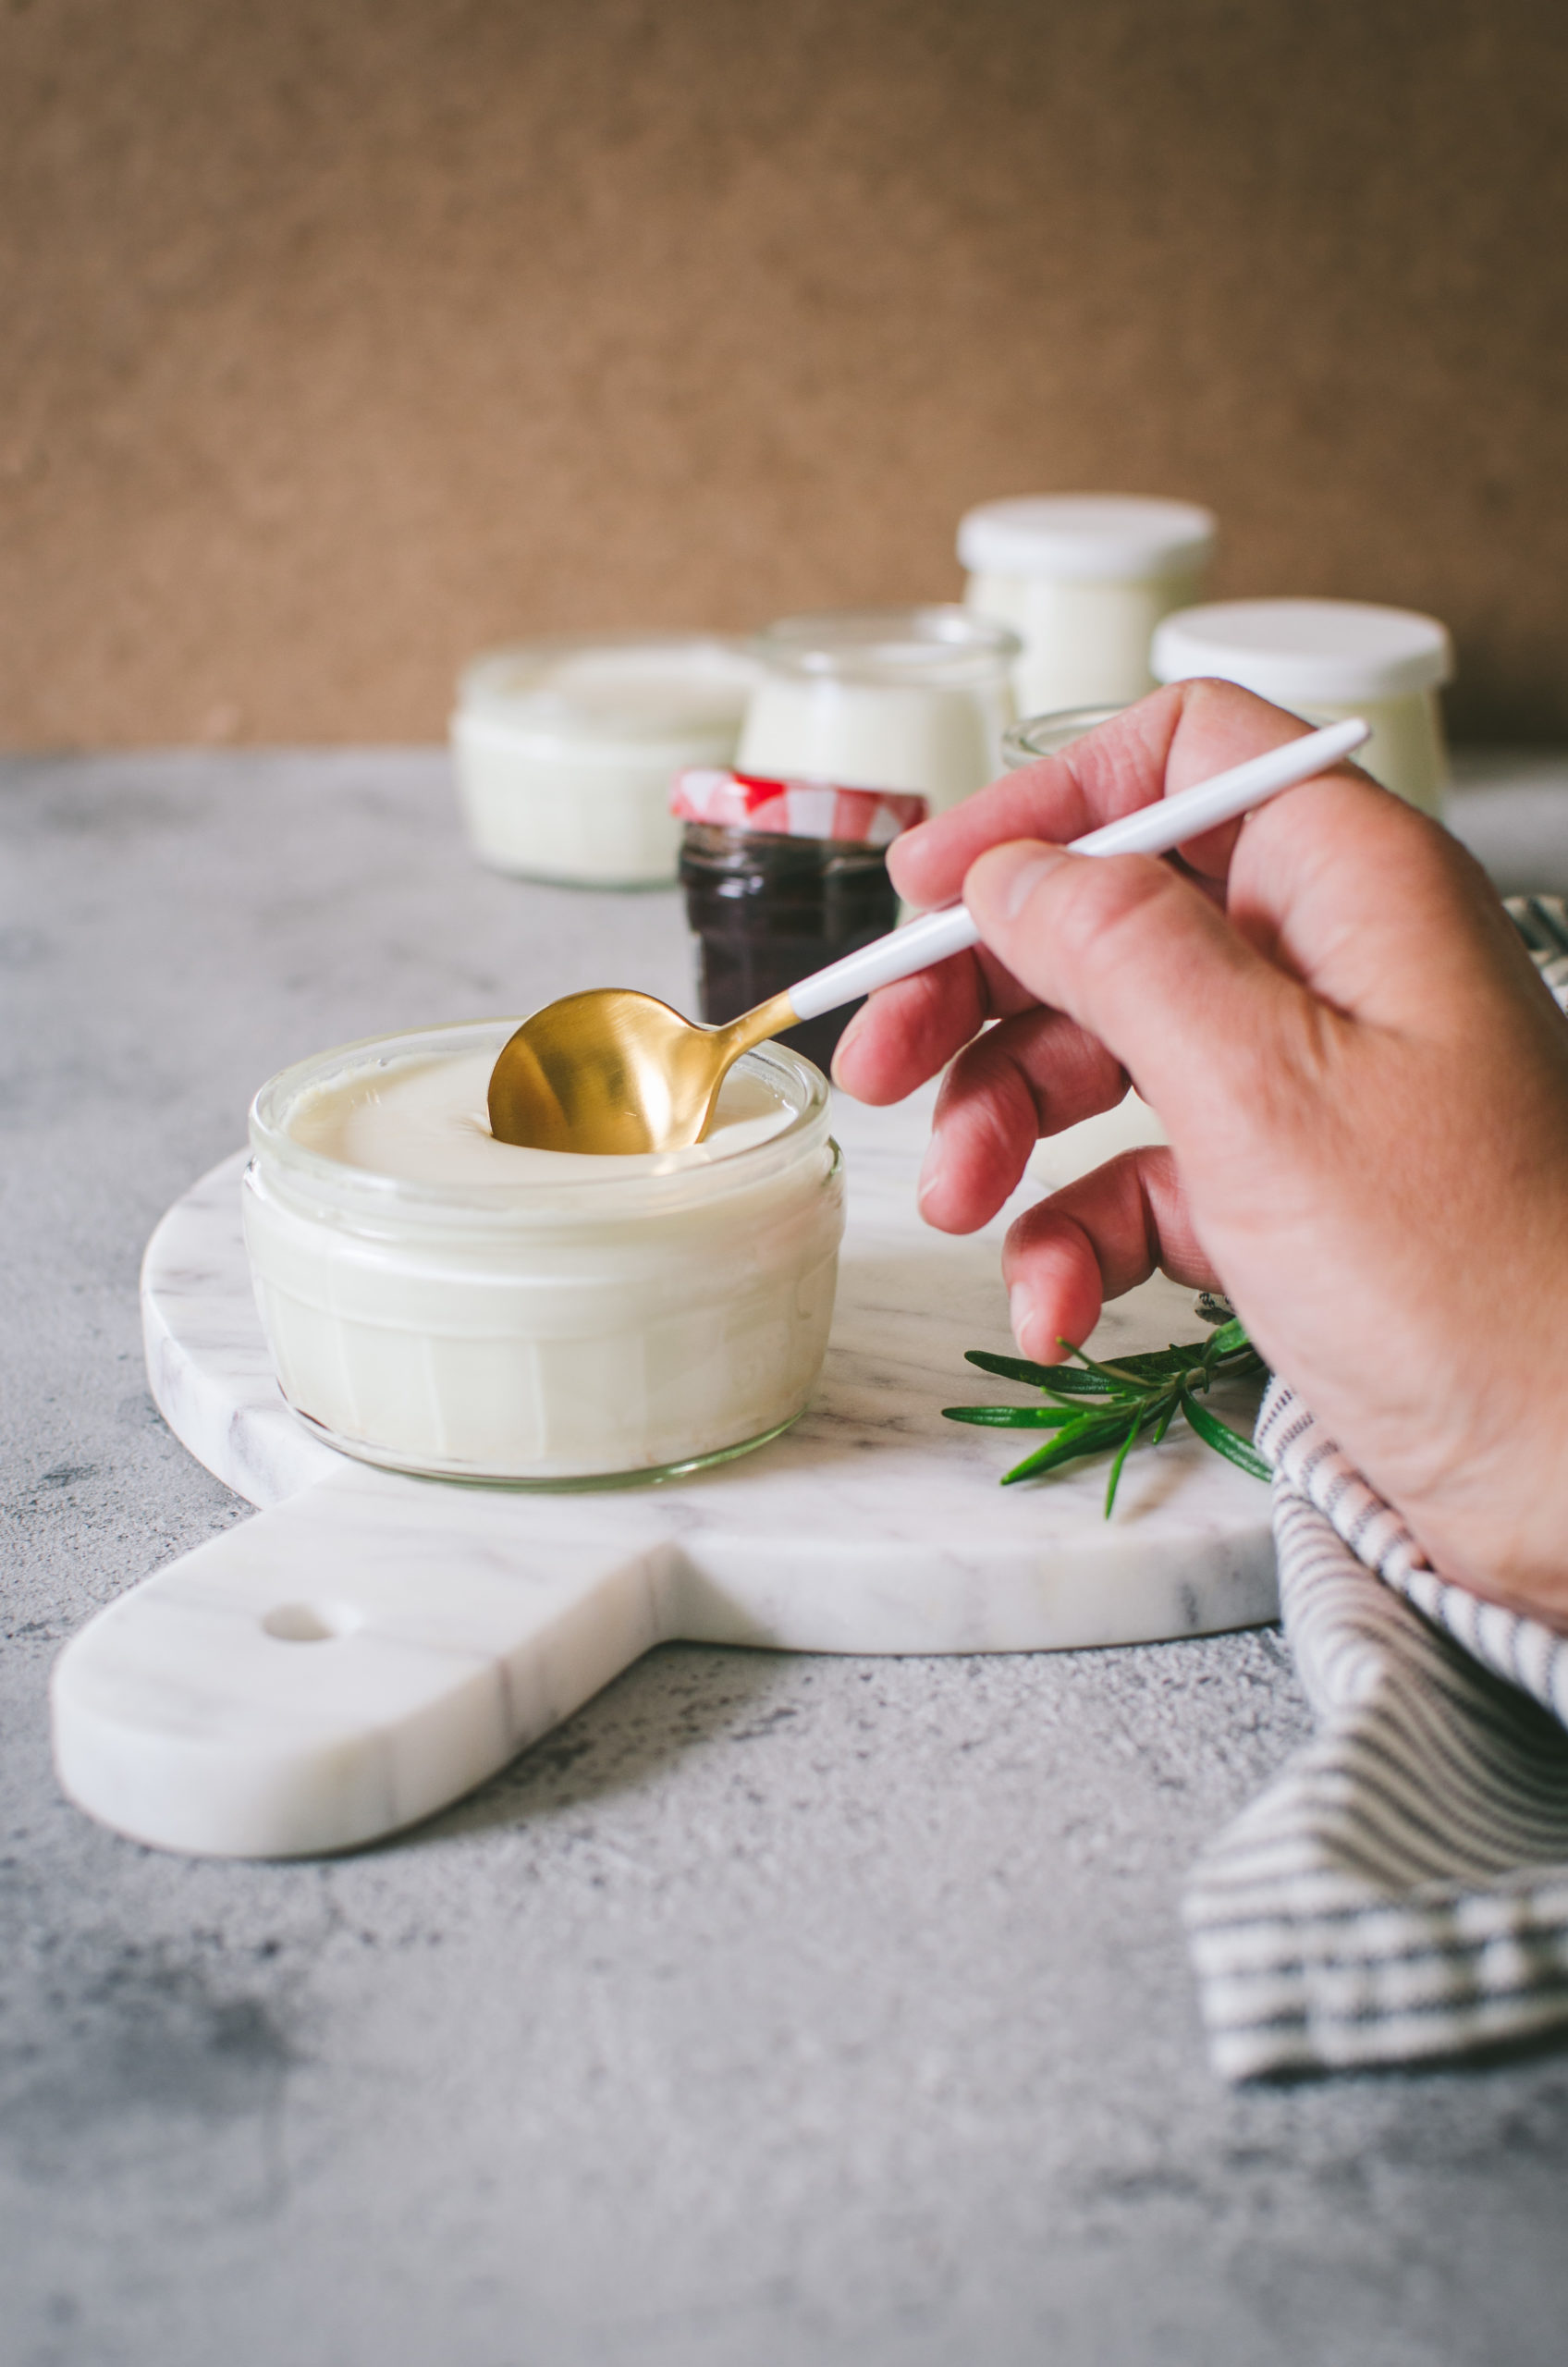 yaourt maison sans yaourtière